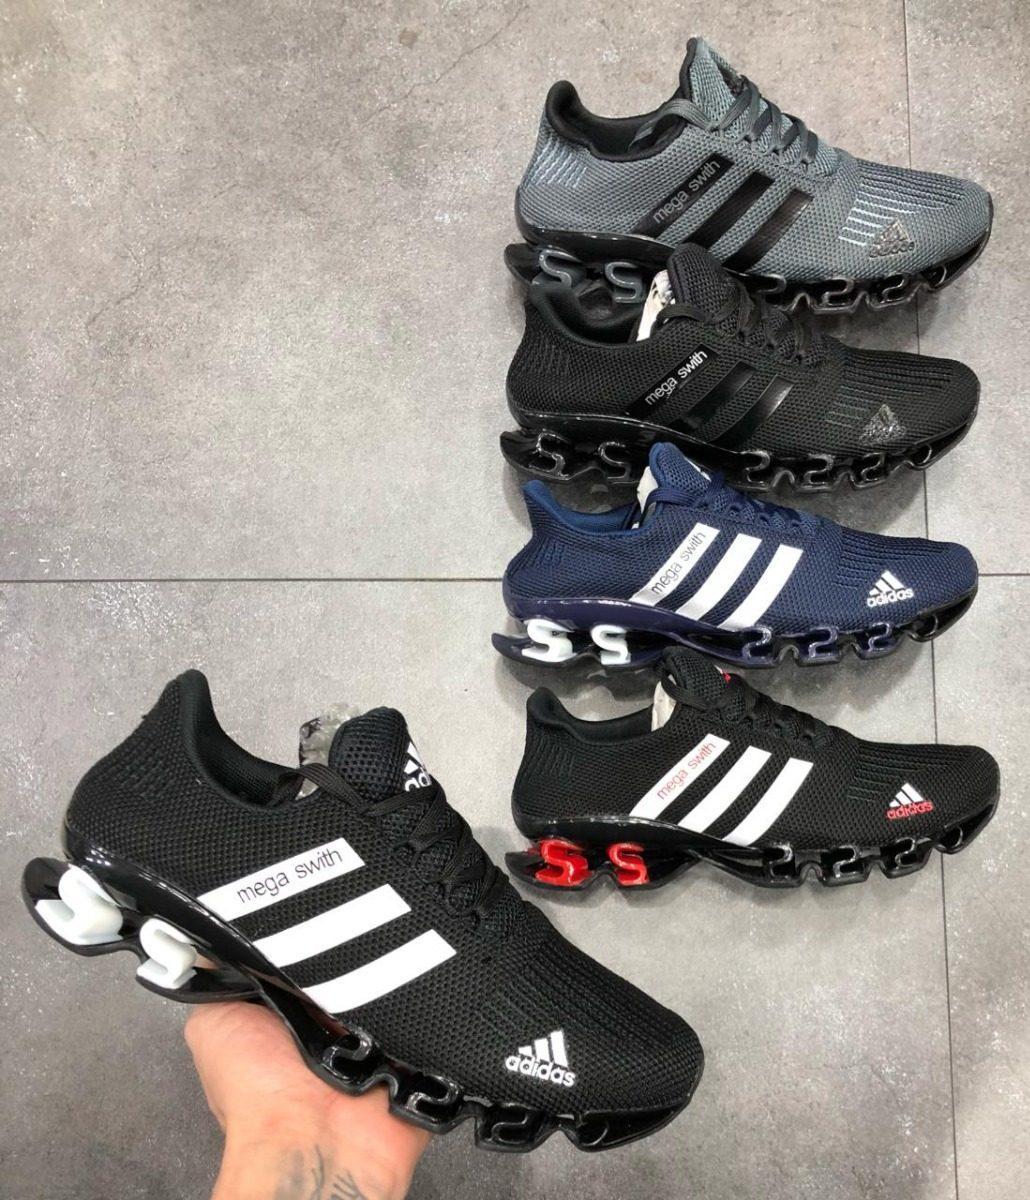 Boutique en ligne 9f99f 2b3e6 Zapatillas Tenis adidas Ultima Coleccion 2019 Original